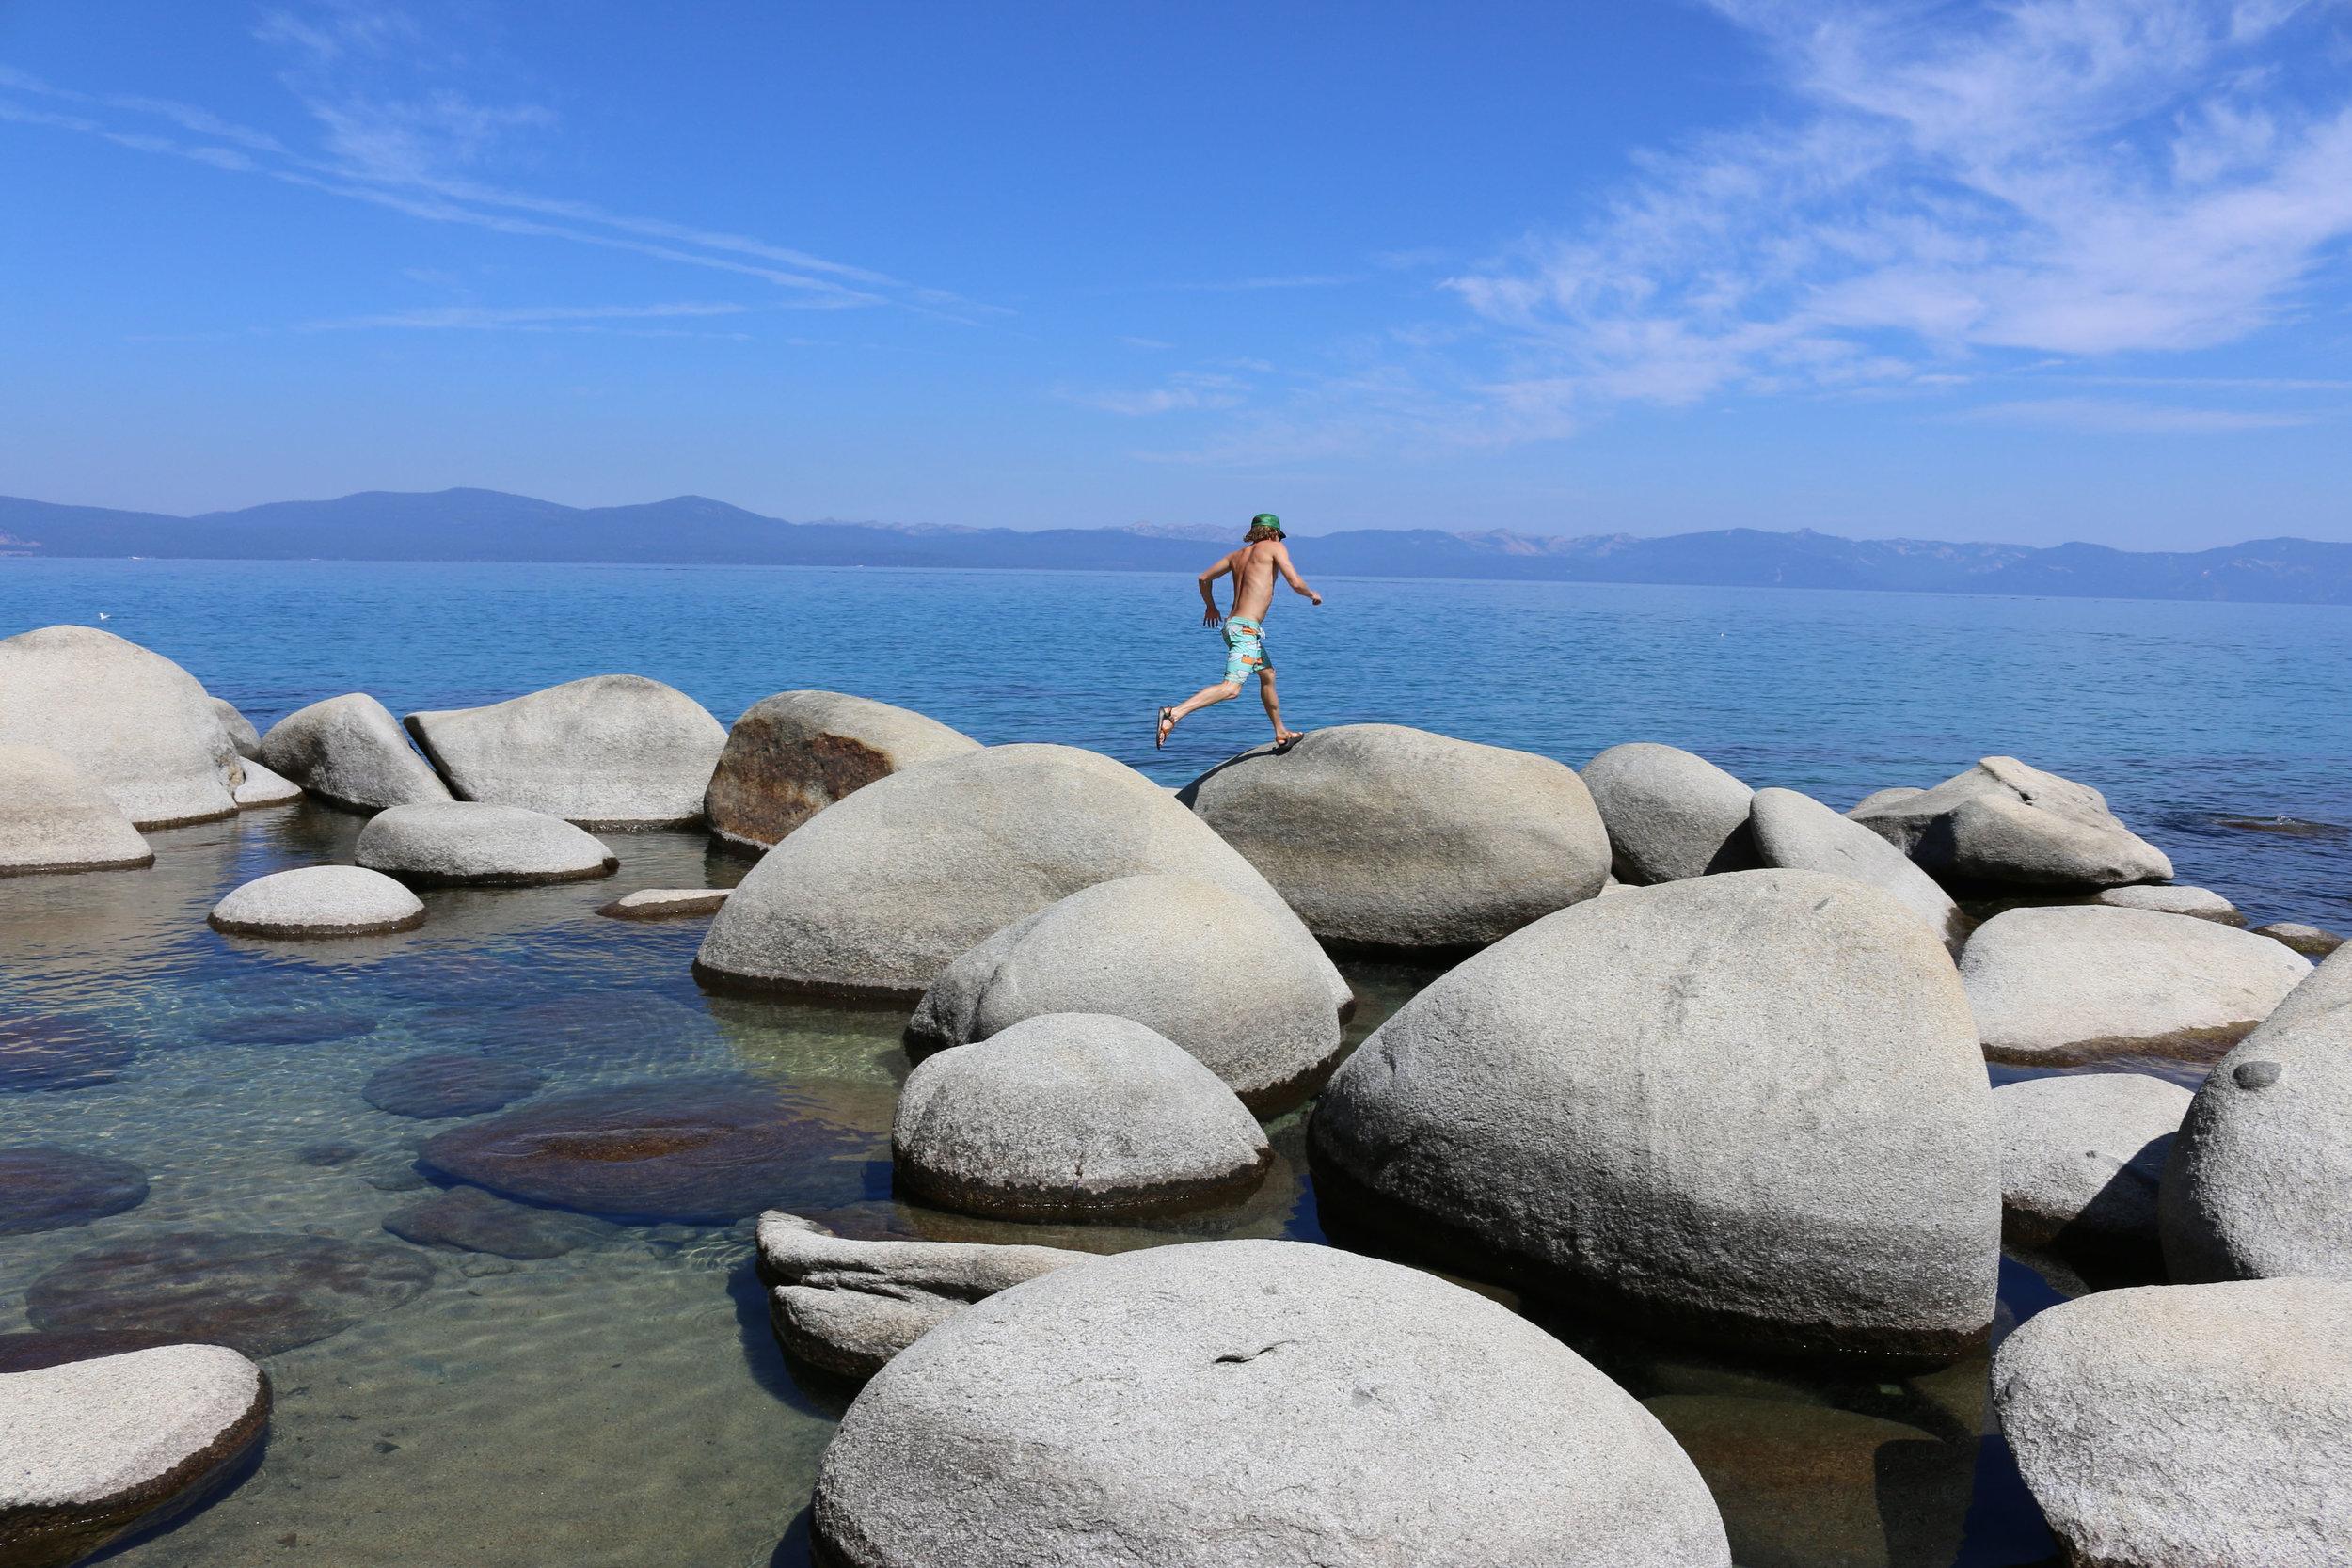 Summer days at Hidden Beach in Lake Tahoe, NV